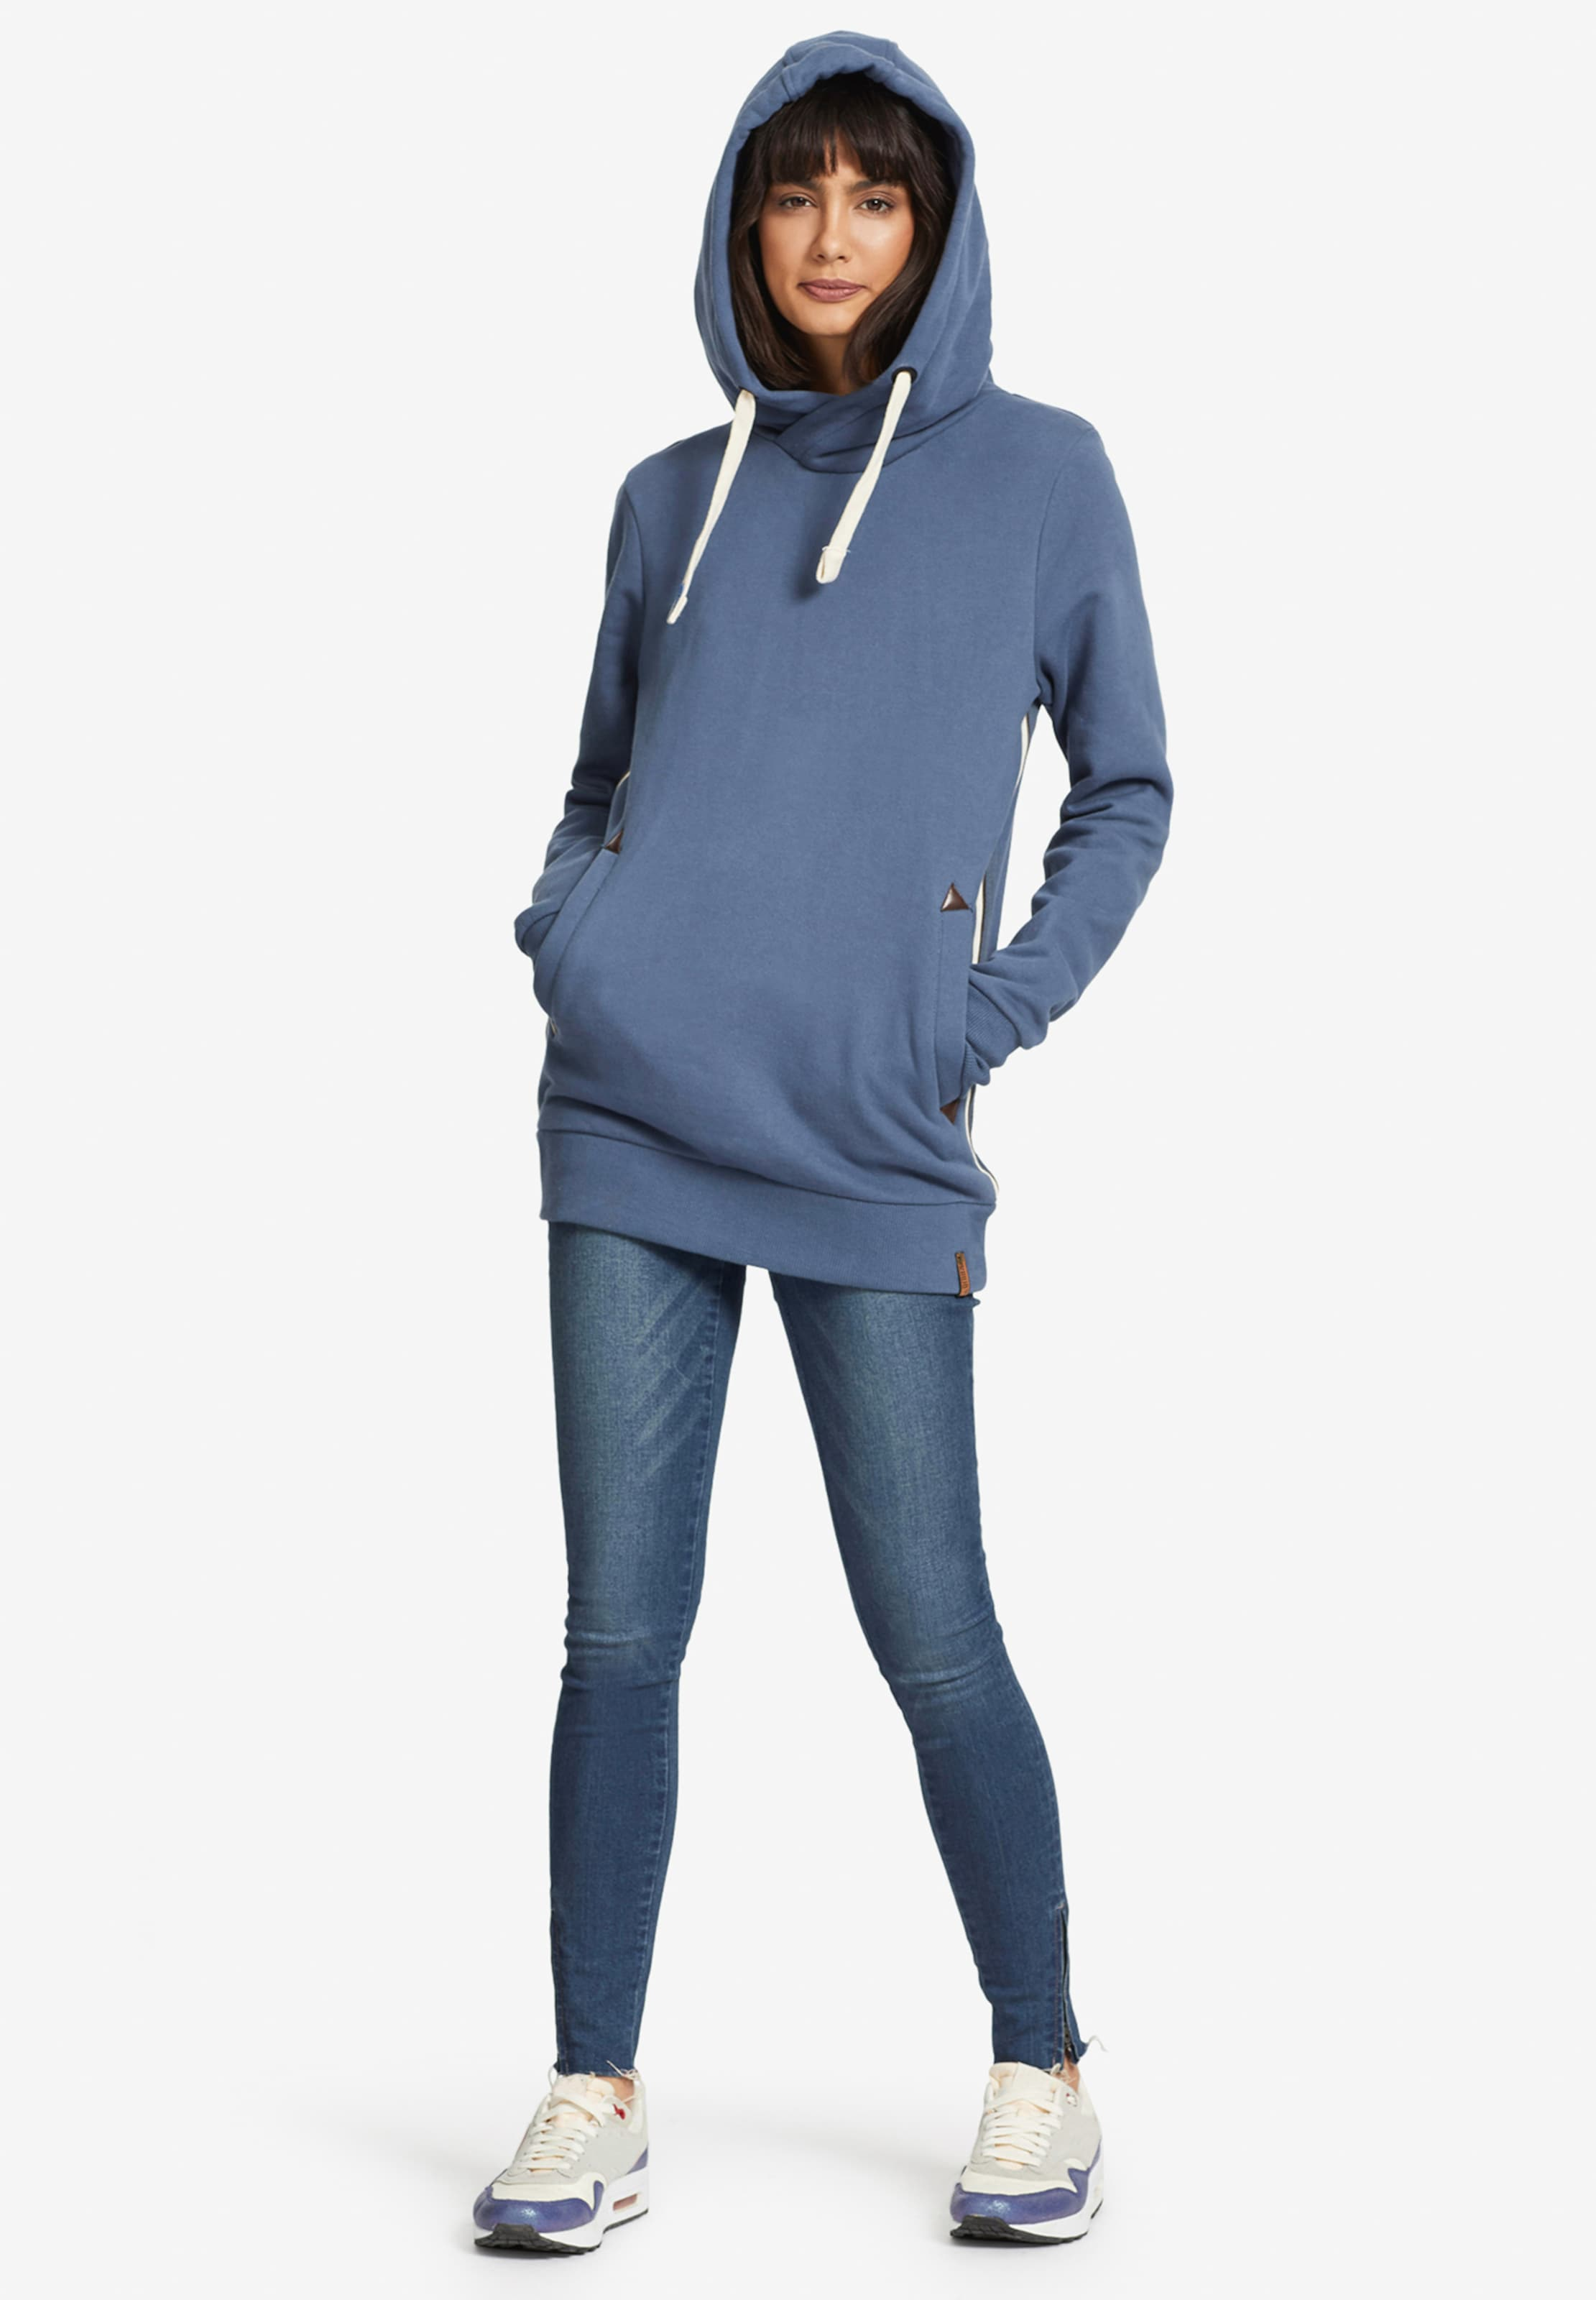 shirt En 'ulyssa' MarronCorail Sweat Blanc Khujo shdtQrCBx